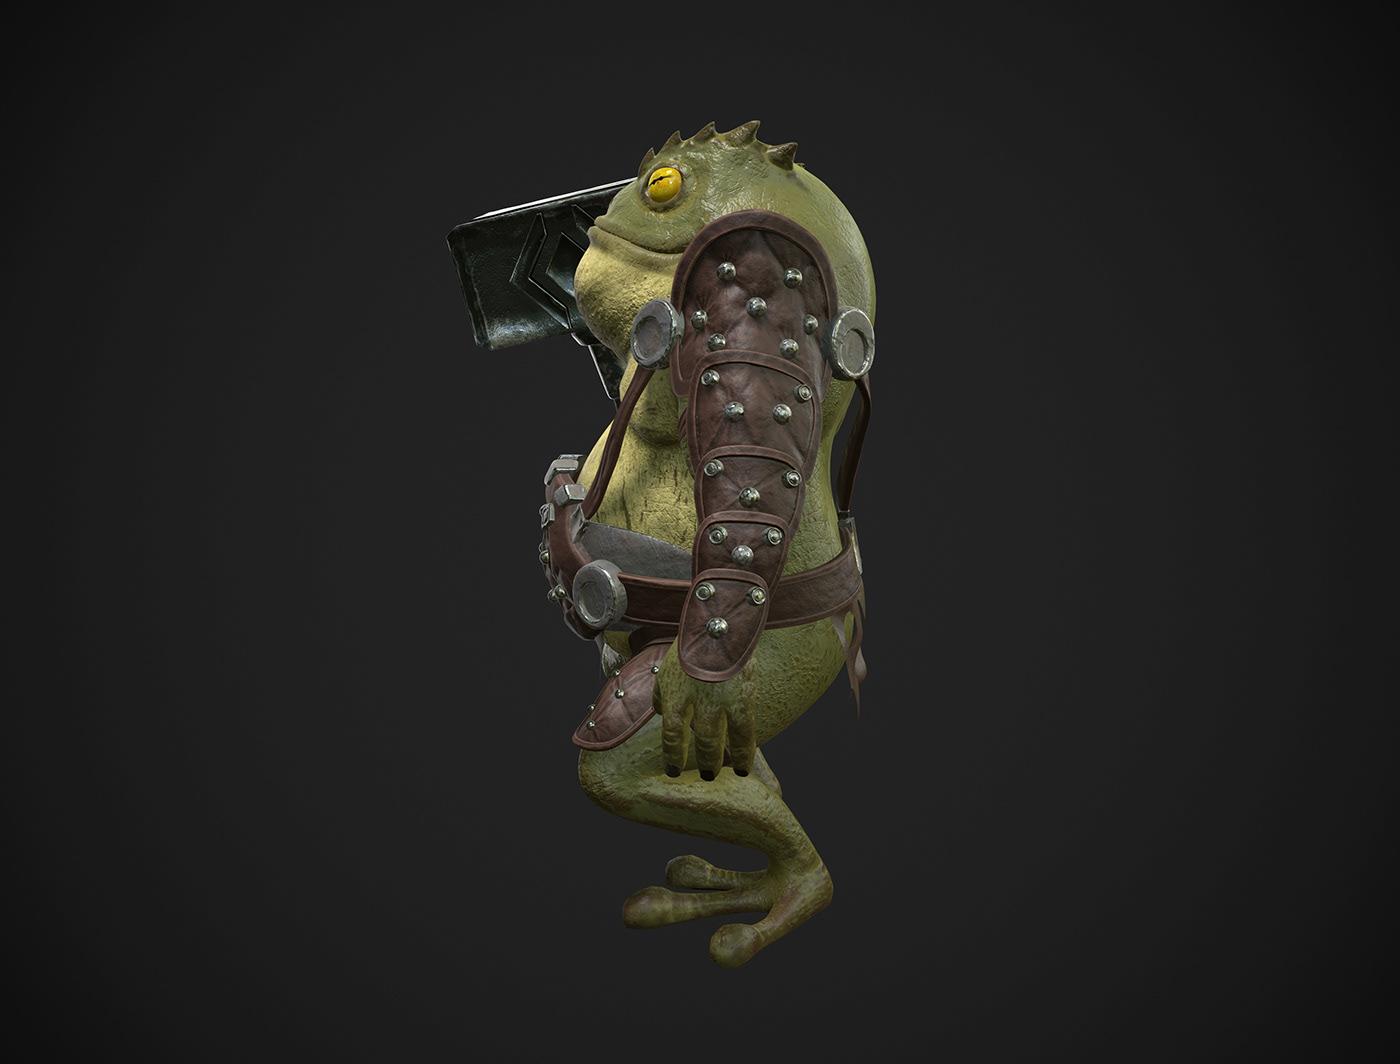 3ds max Zbrush substance 3d modeler generalist character artist warrior